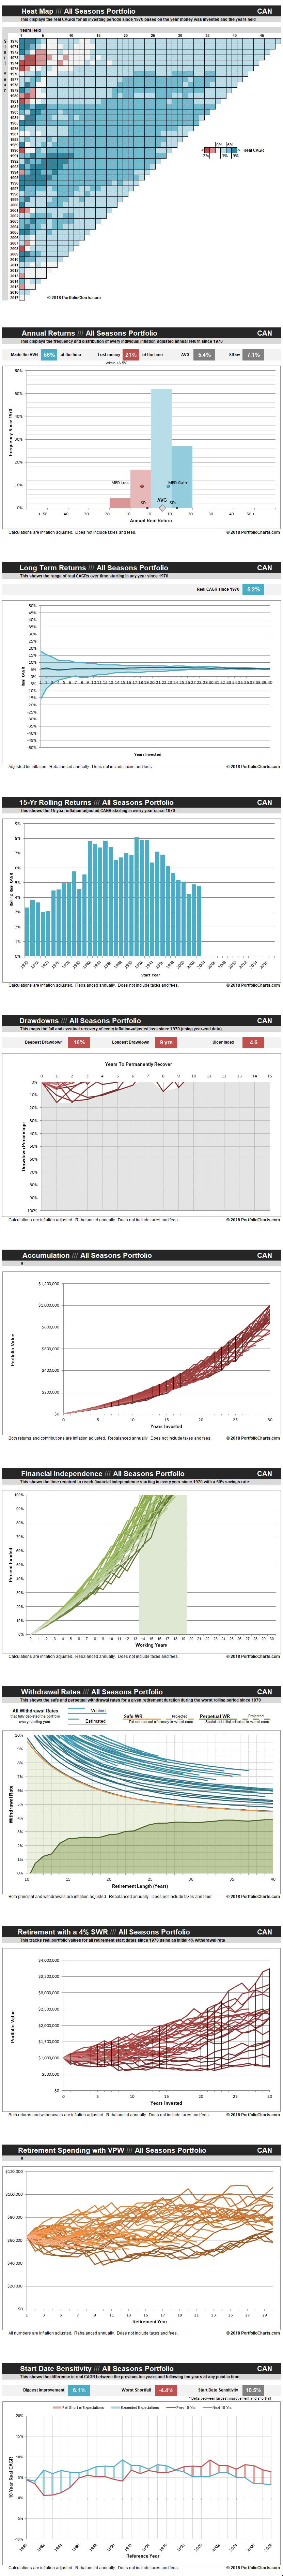 all-seasons-portfolio-CAN-20180508